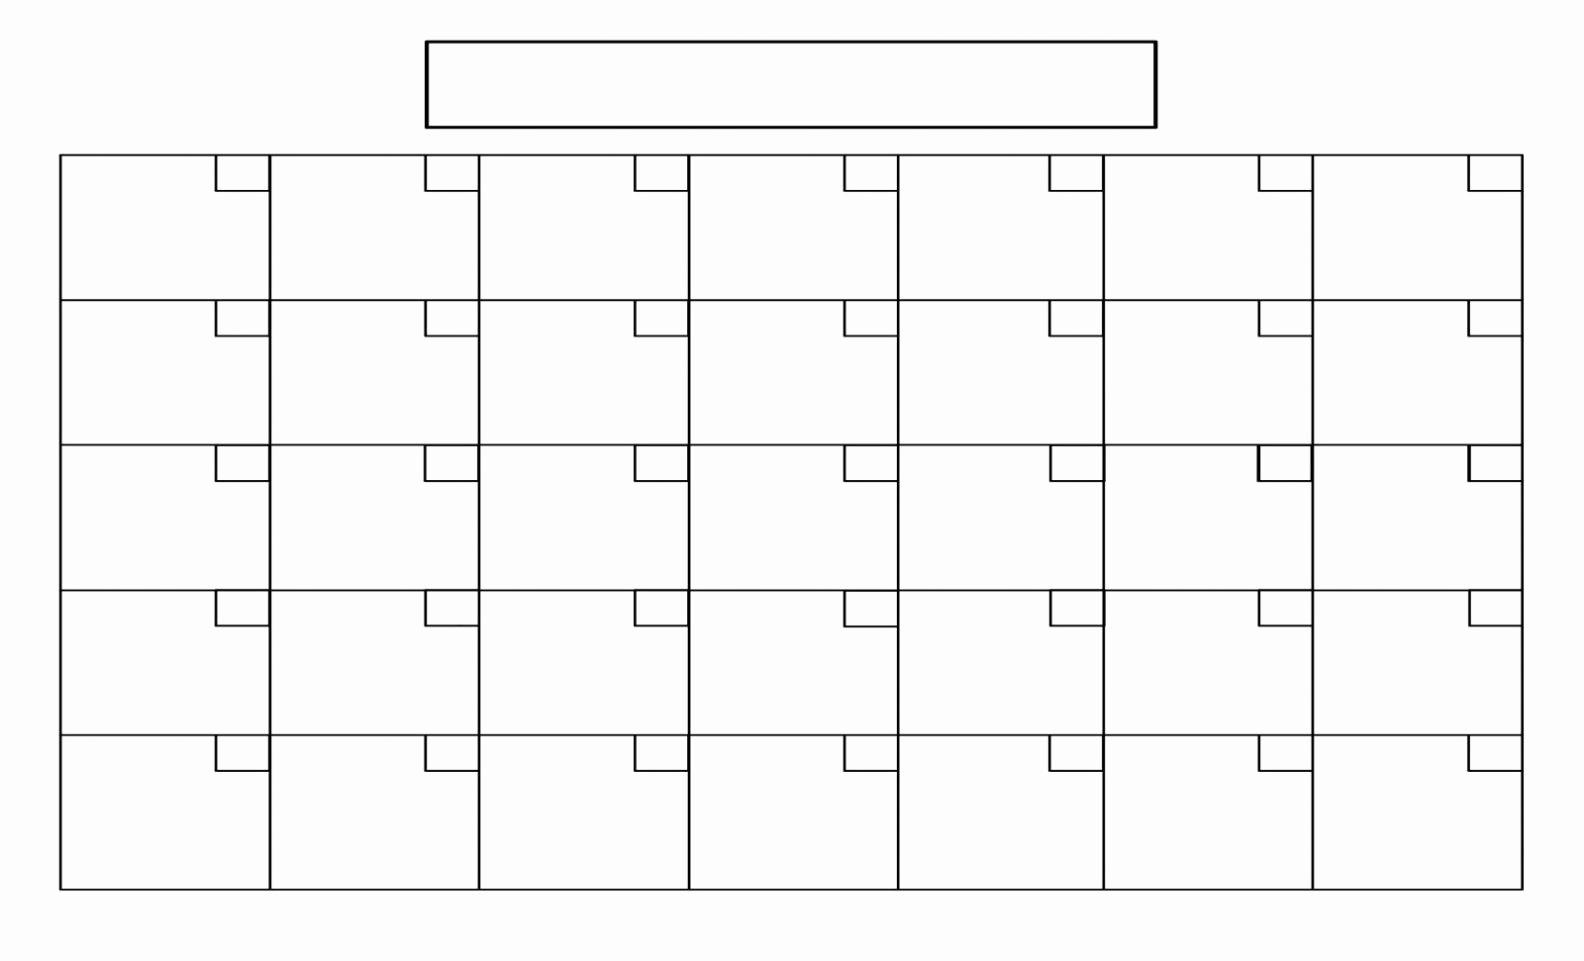 Free 12 Month Calendar 2017 New Free Calendar Printable Template Blank 12 Month Calendar